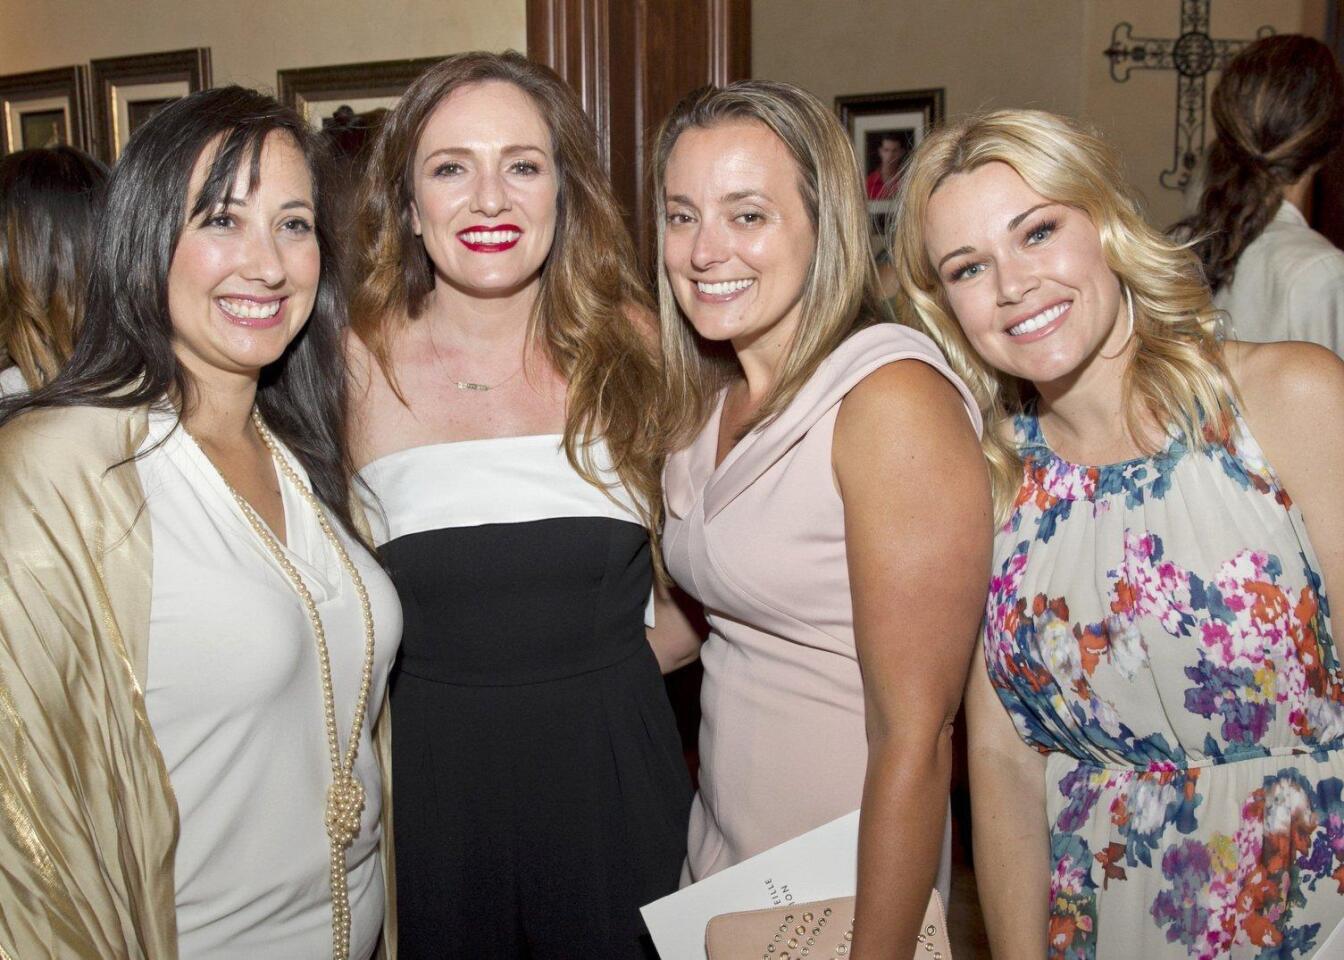 Markita Stamas, Diana Durrell, Kristen Walker, Lindsay Kujawa